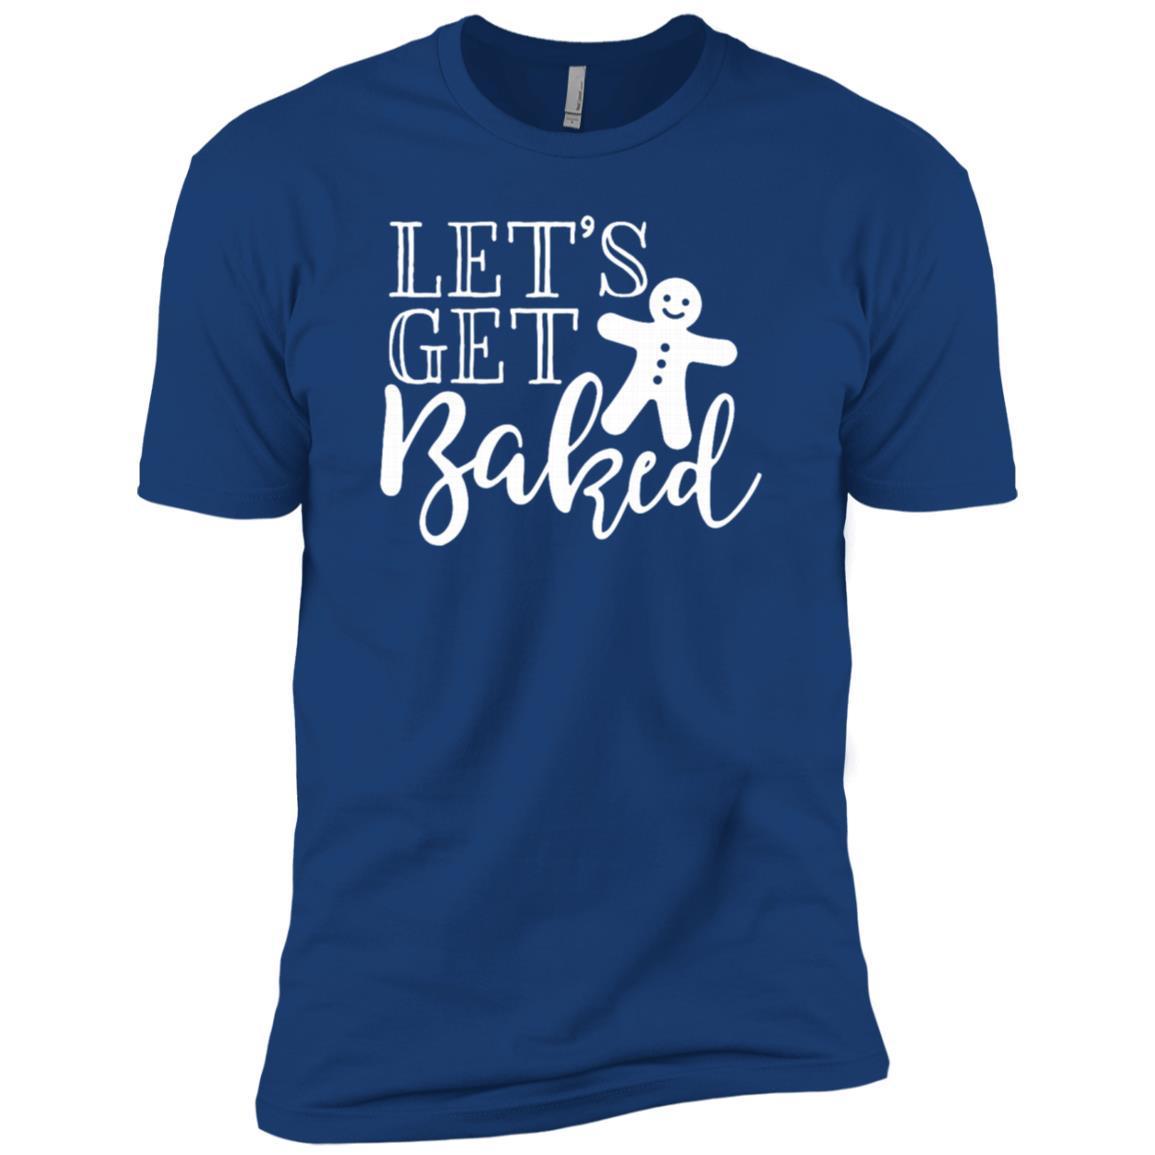 Let's Get Baked Funny Humor Christmas Baking Men Short Sleeve T-Shirt